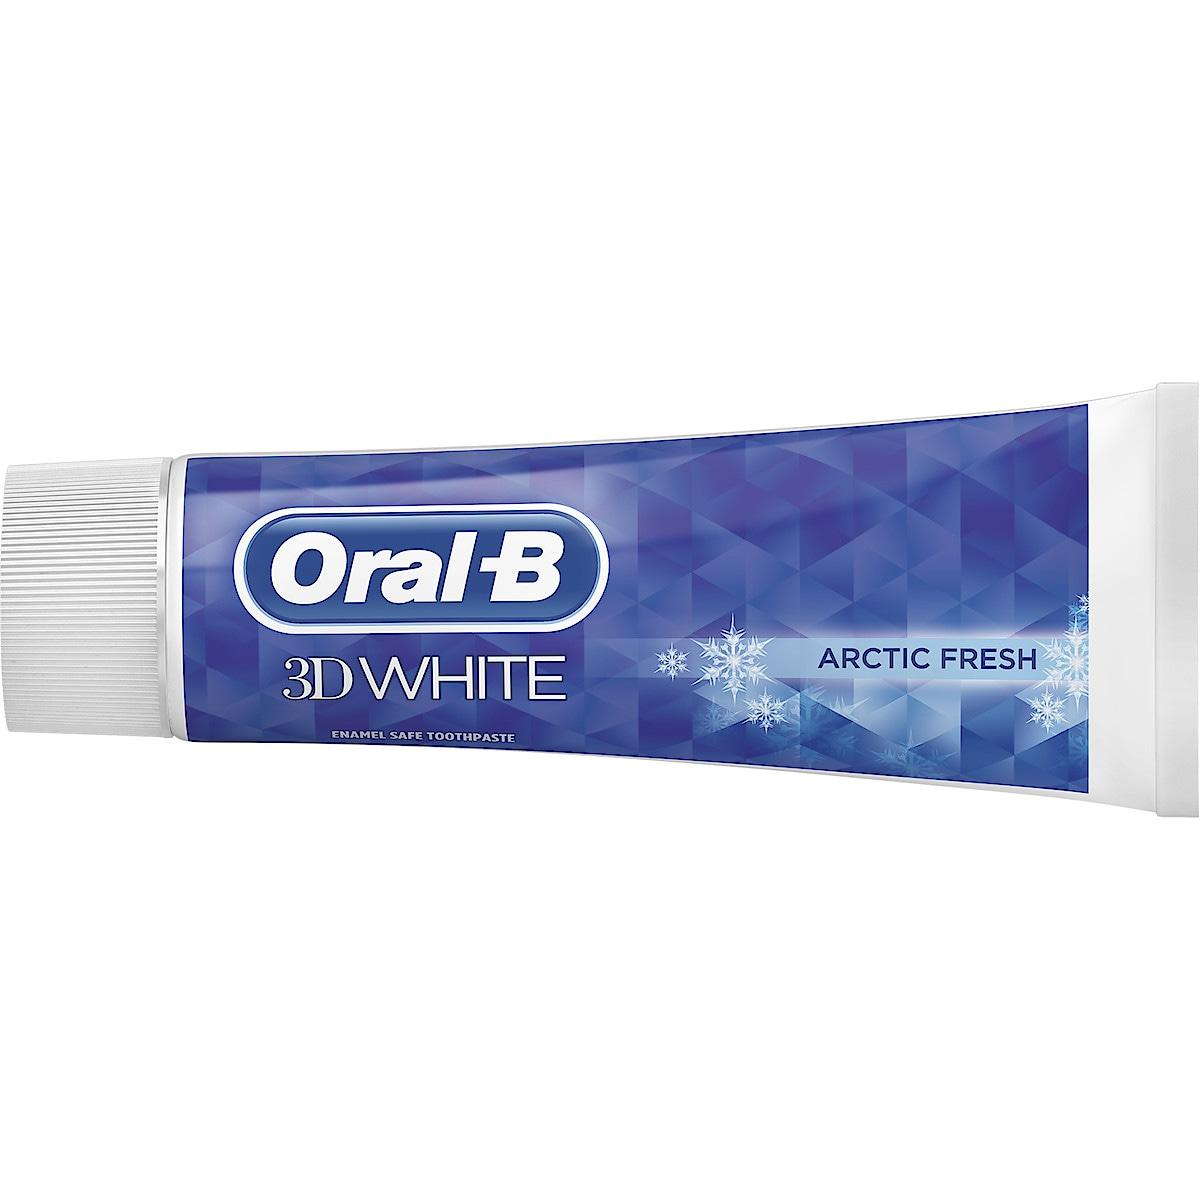 Hammastahna Oral-B 3D White Arctic Fresh